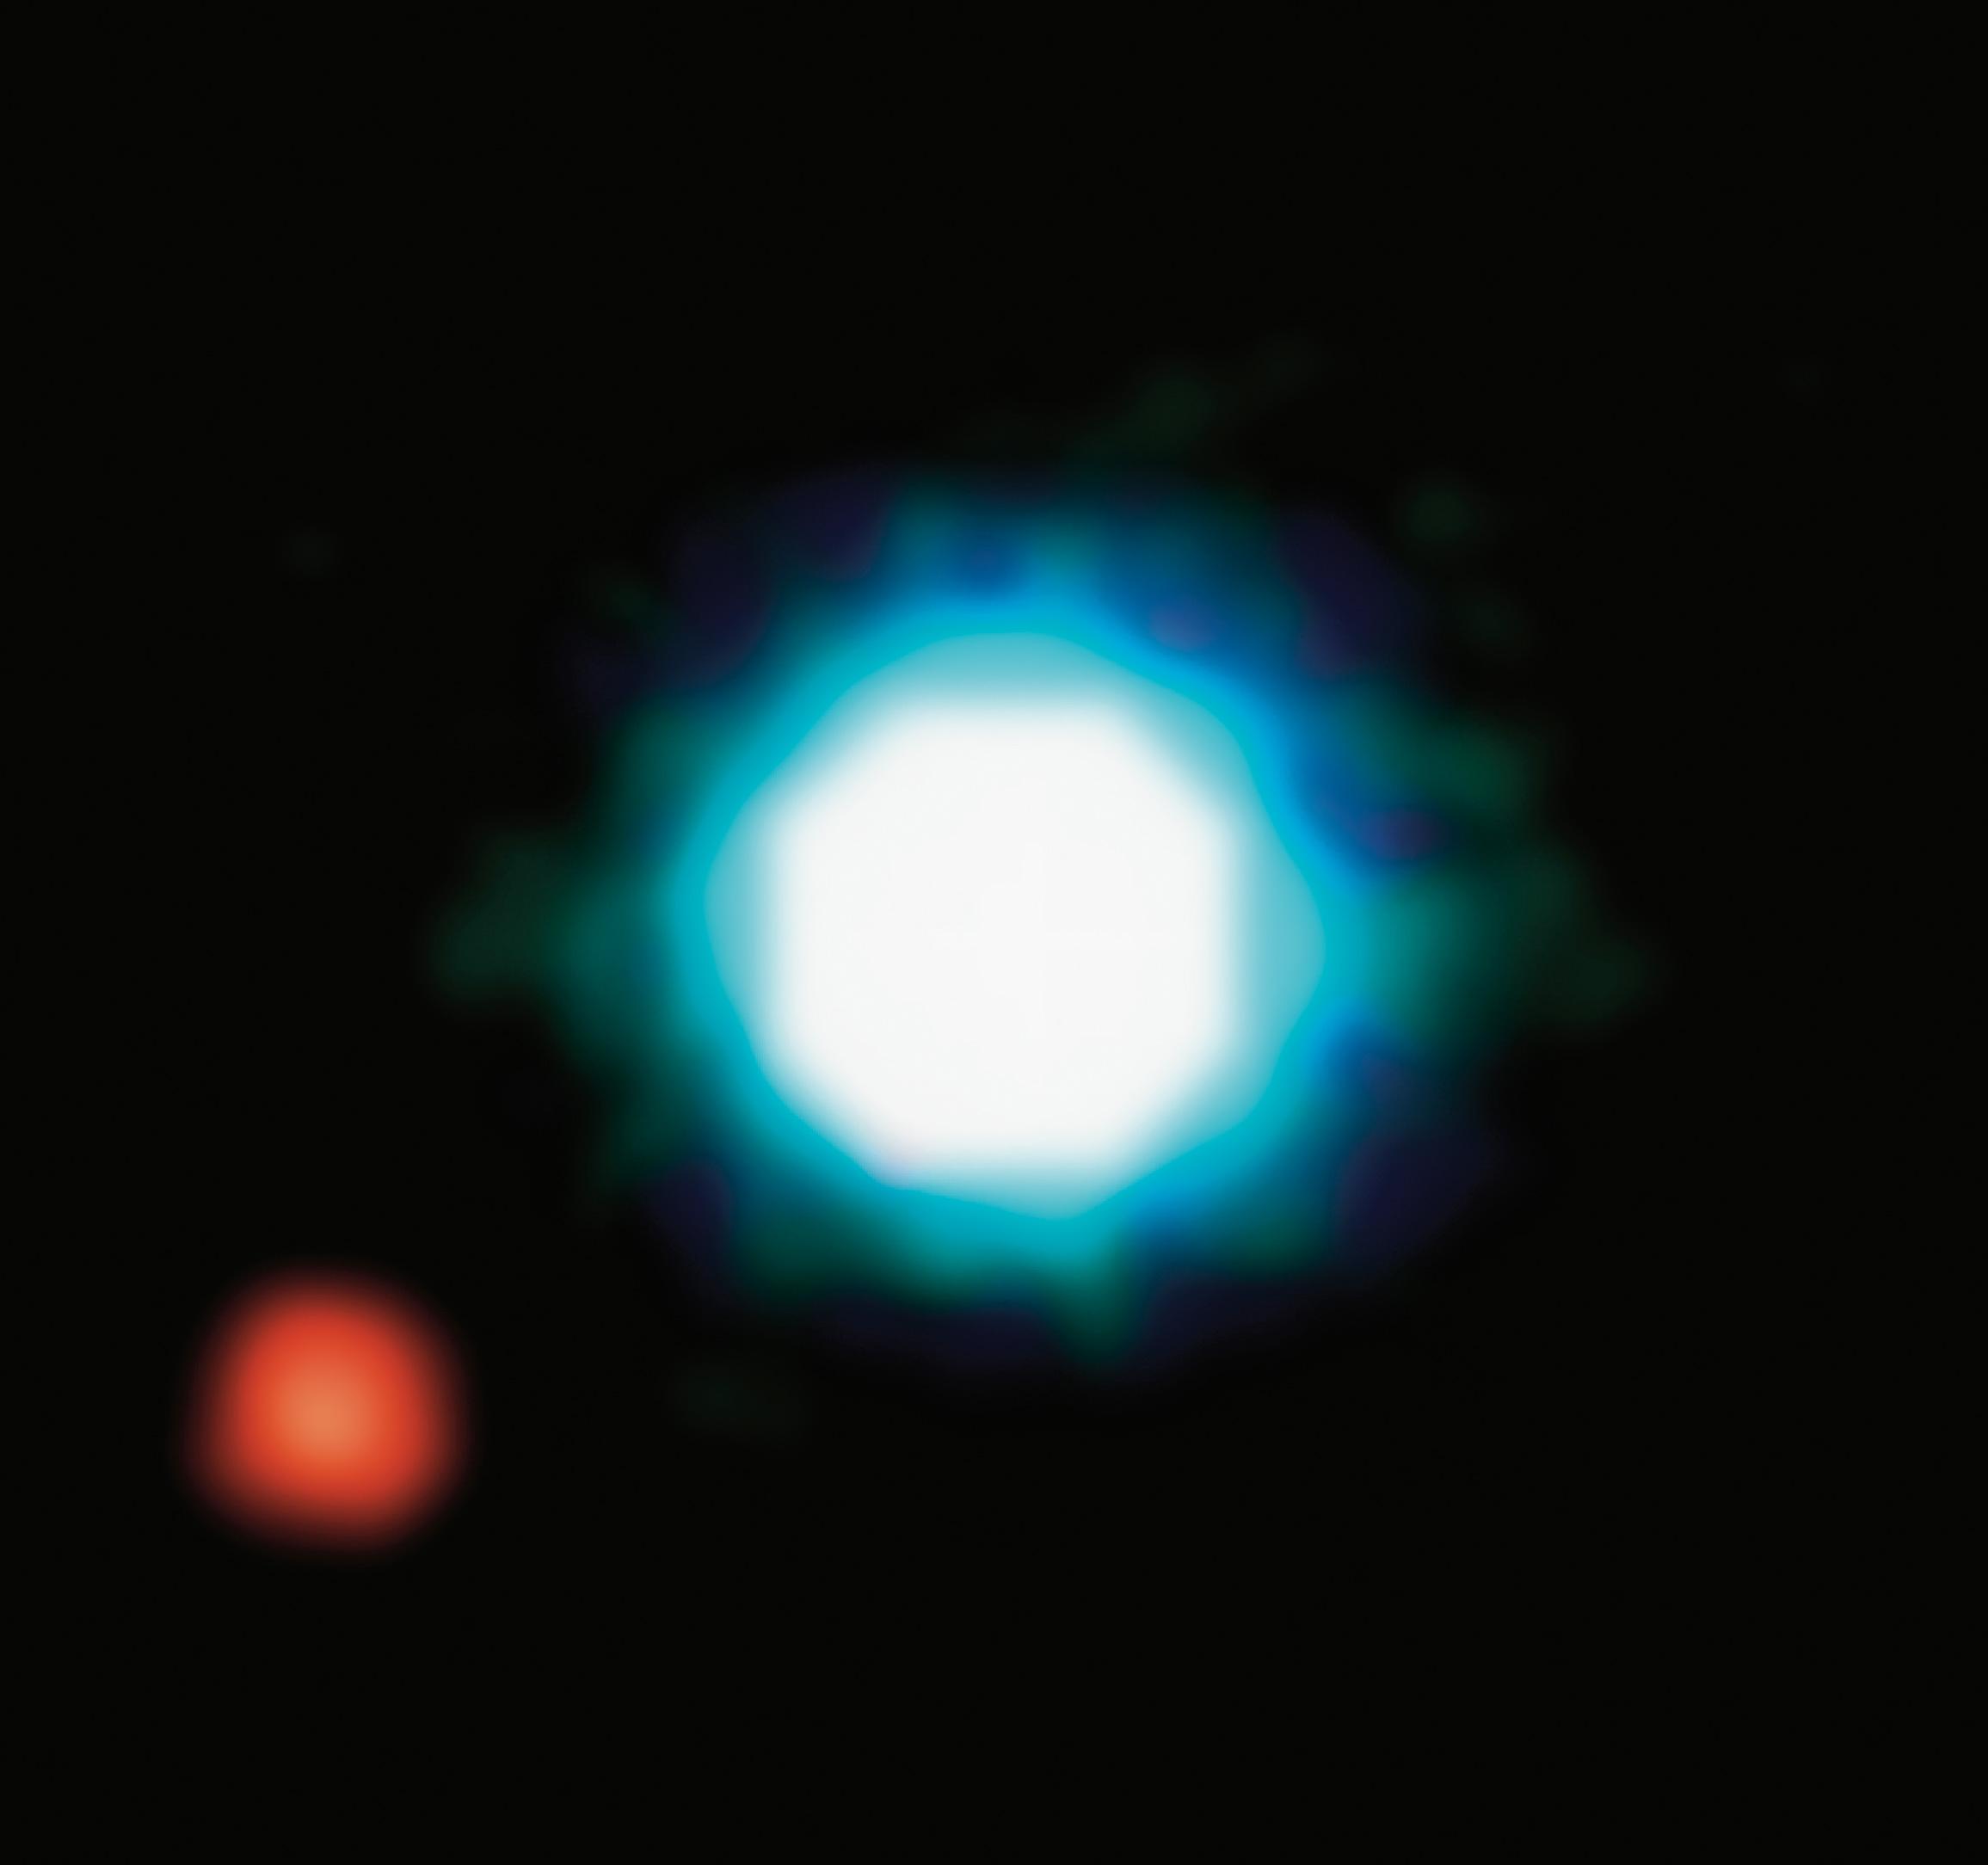 rilevazione diretta di un pianeta